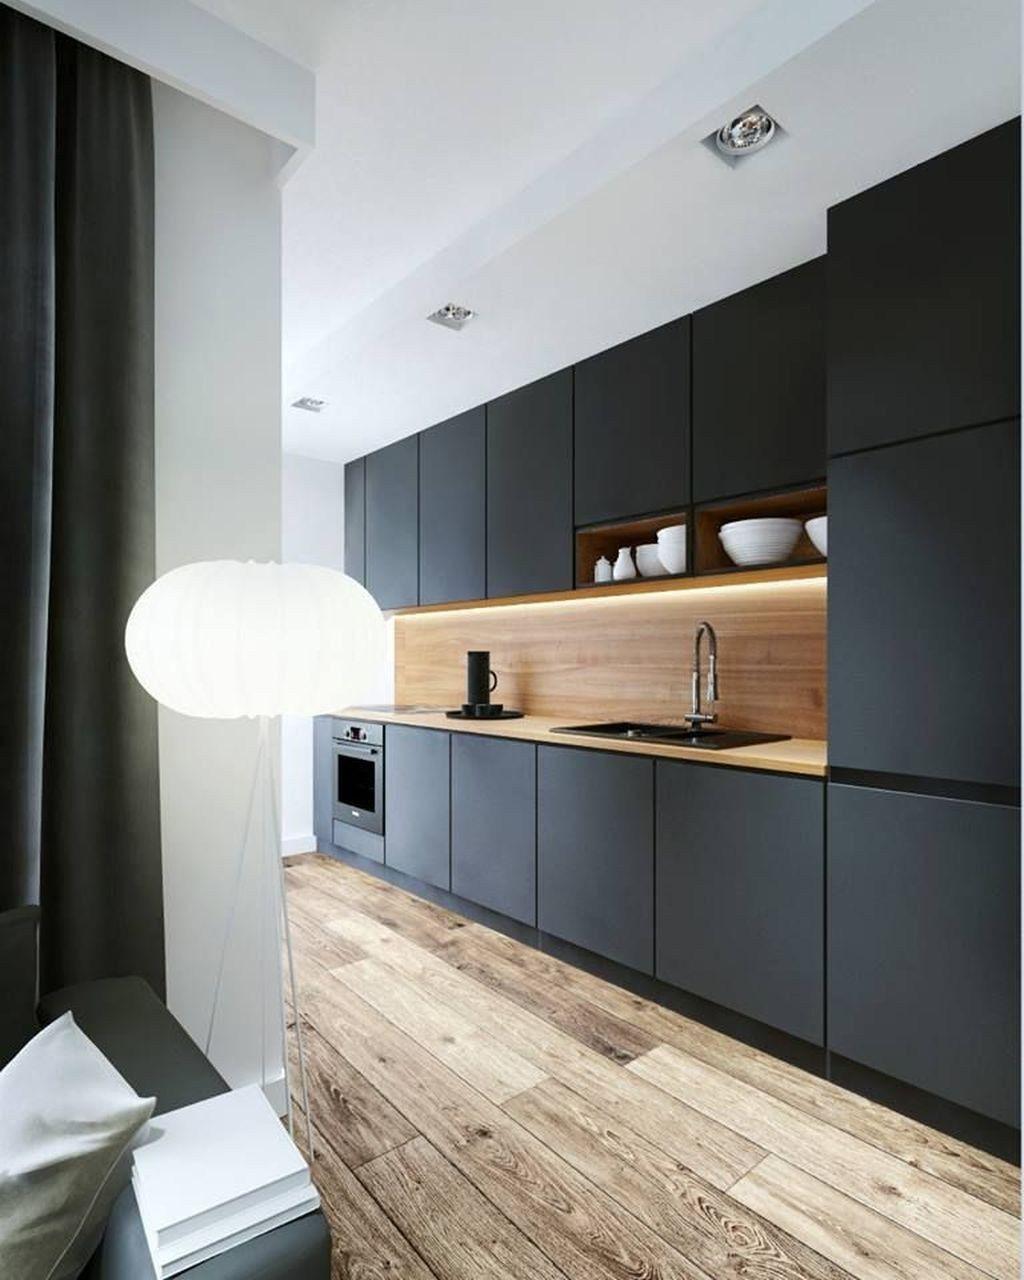 Awesome black kitchen design ideas nyc en pinterest